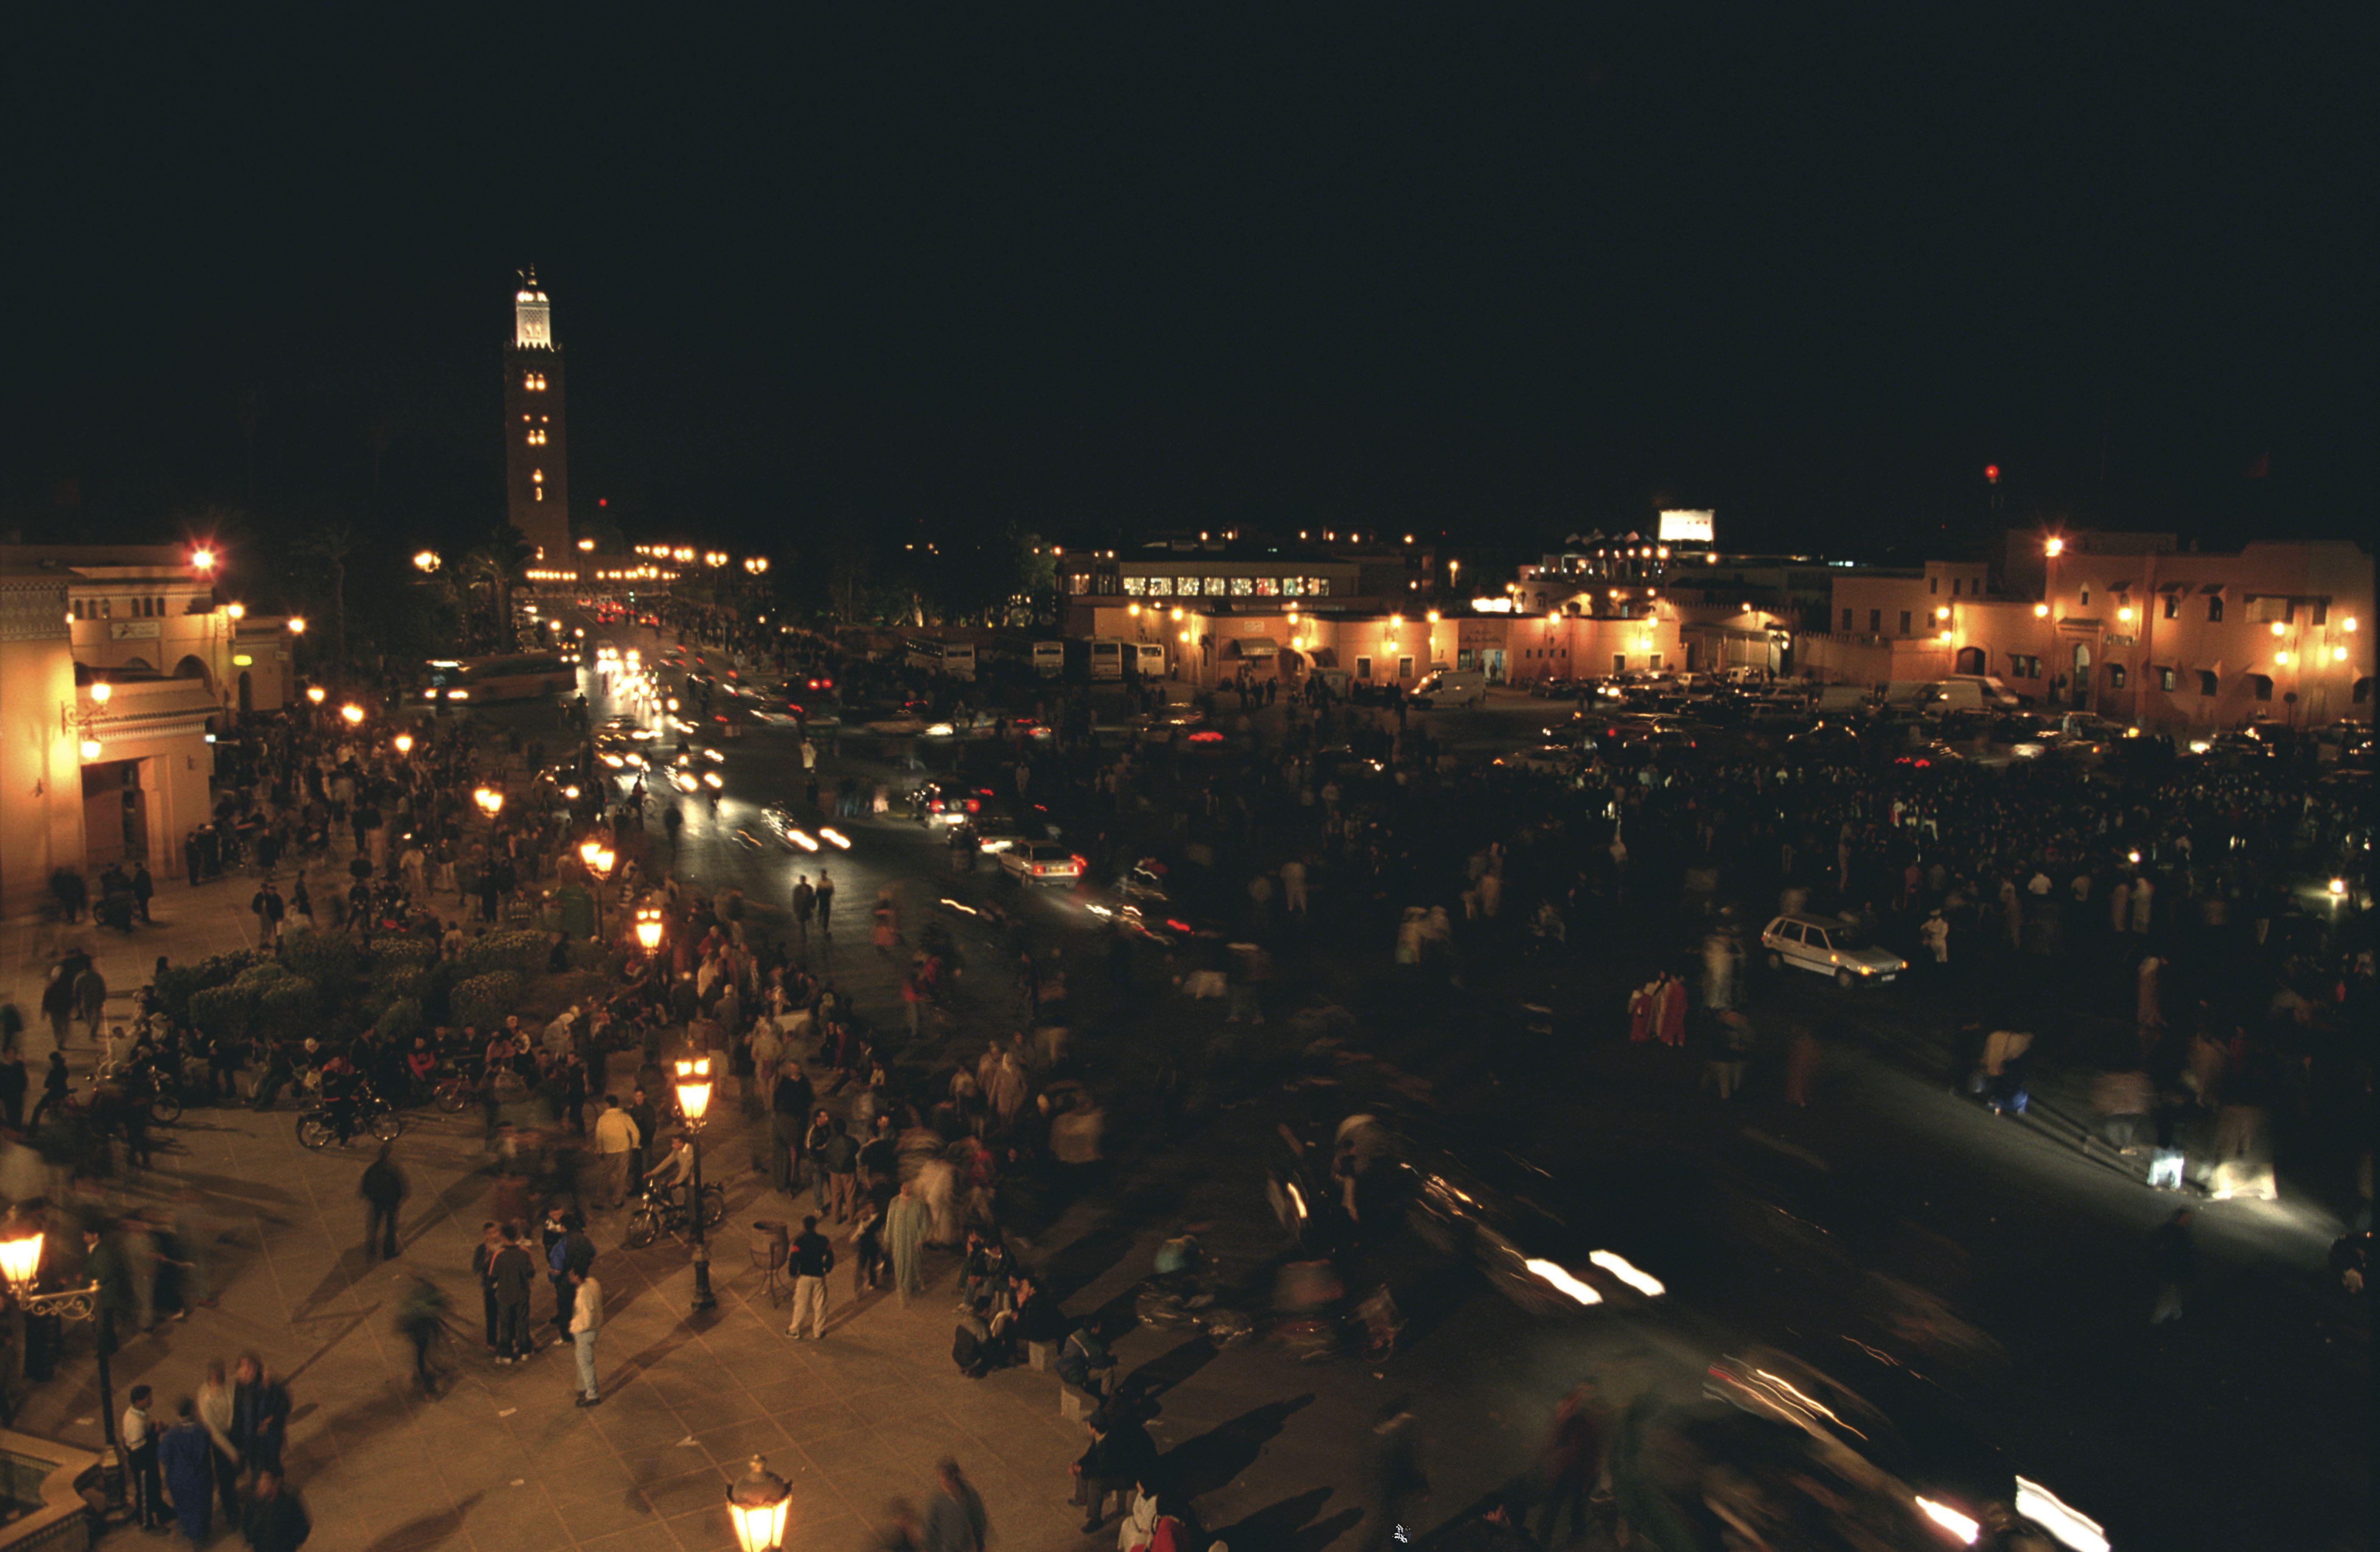 Marrakech de noche